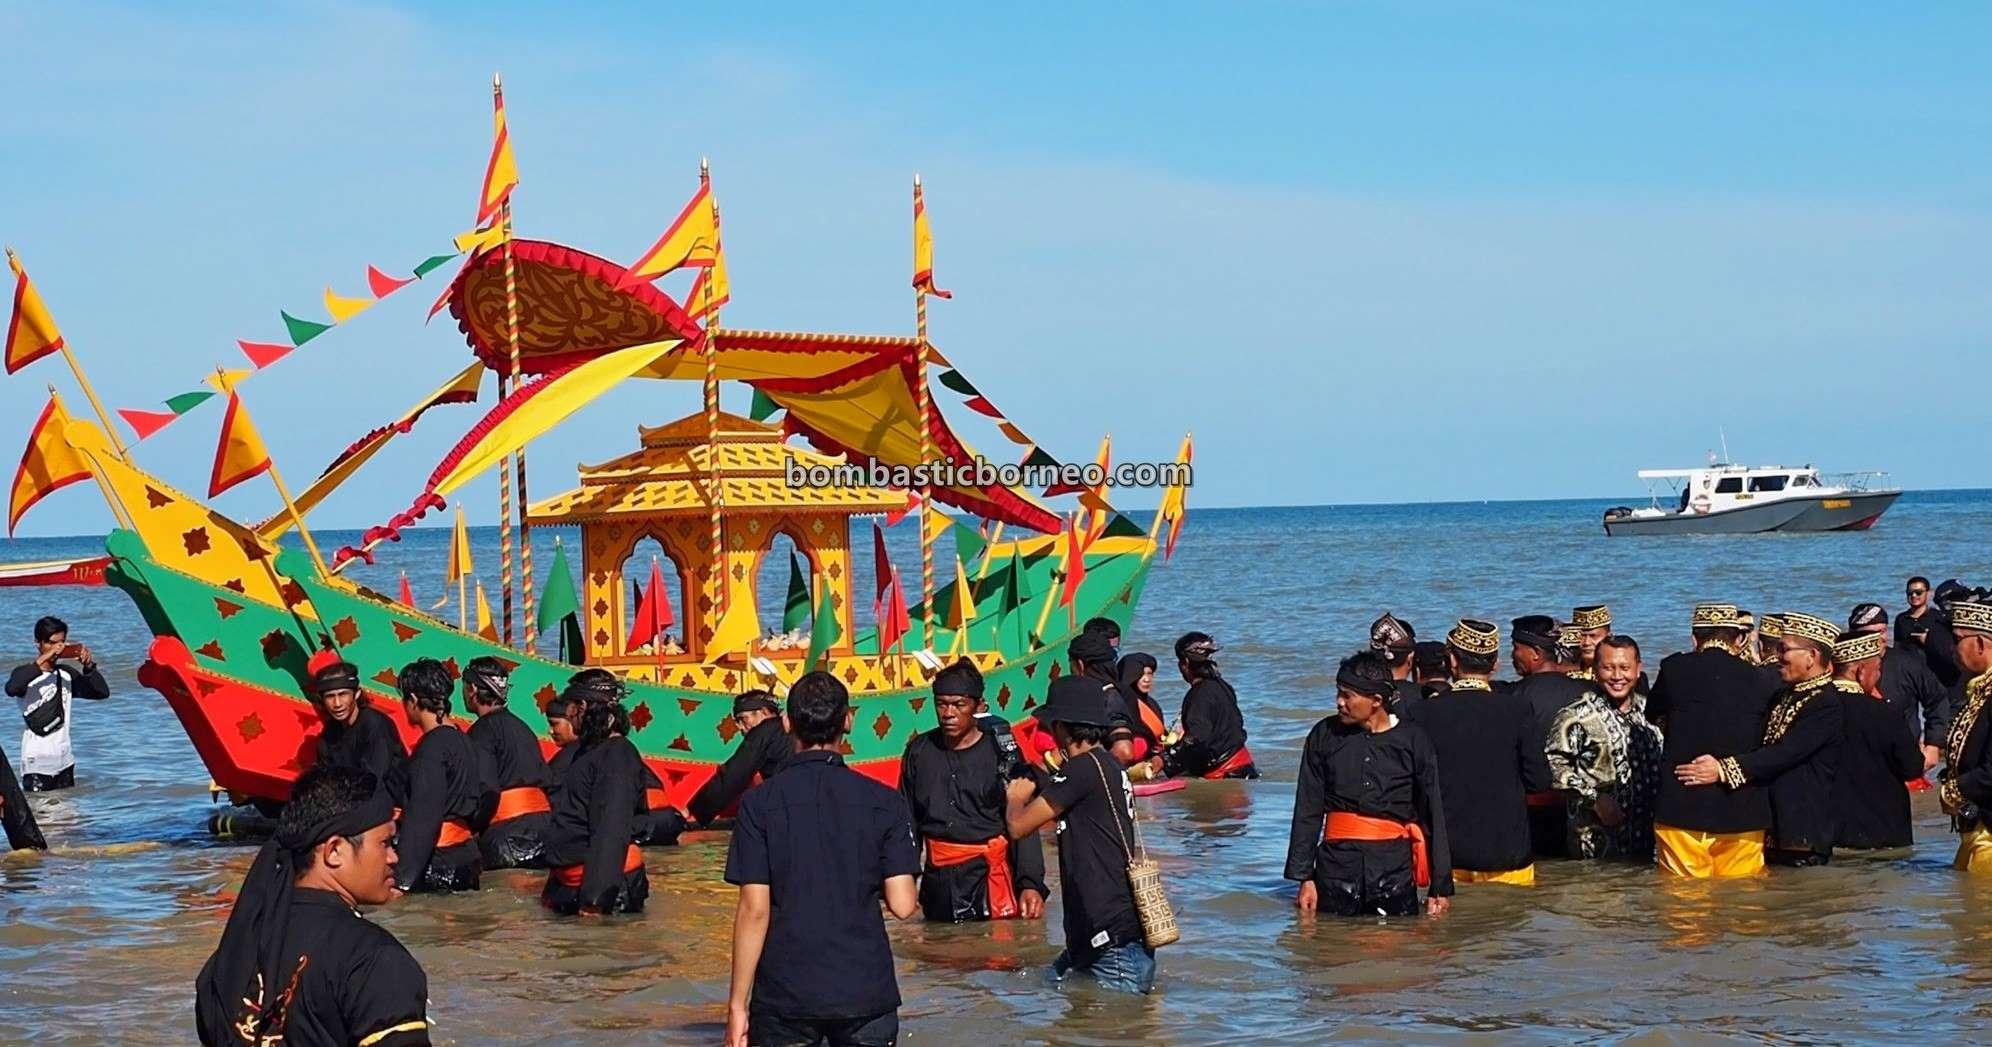 Padaw Tuju Dulung boat, Festival Iraw Tengkayu, Suku Dayak Tidung, upacara adat, authentic, traditional, culture, native, tribal, Indonesia, North Kalimantan, Tarakan, Obyek wisata, Tourism, Trans Borneo